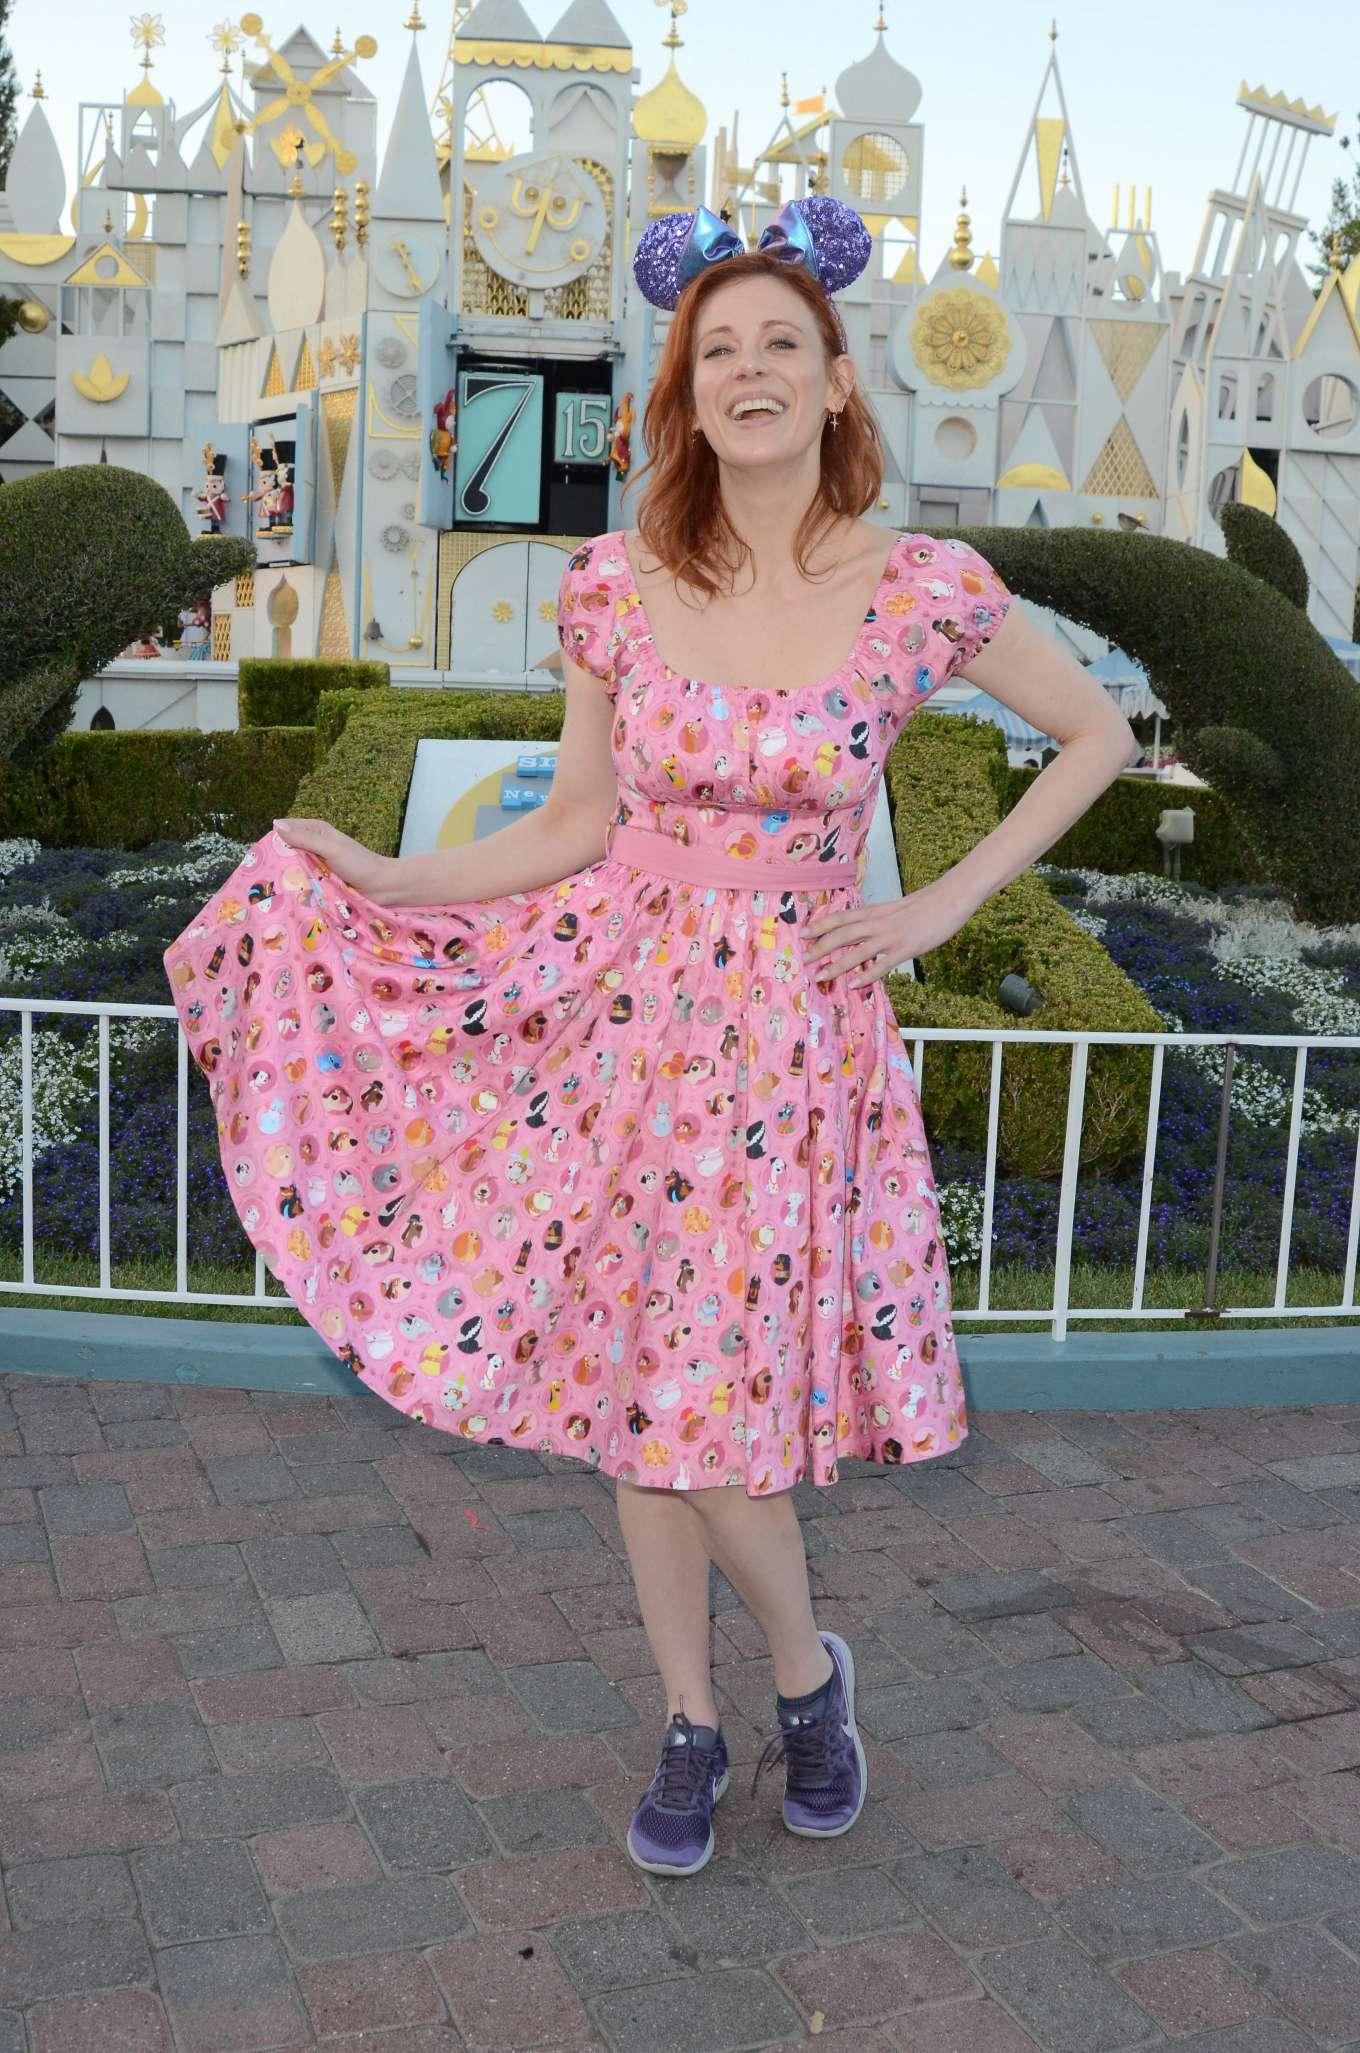 Maitland Ward 2019 : Maitland Ward: Celebrating International Star Wars Day at Disneyland -20